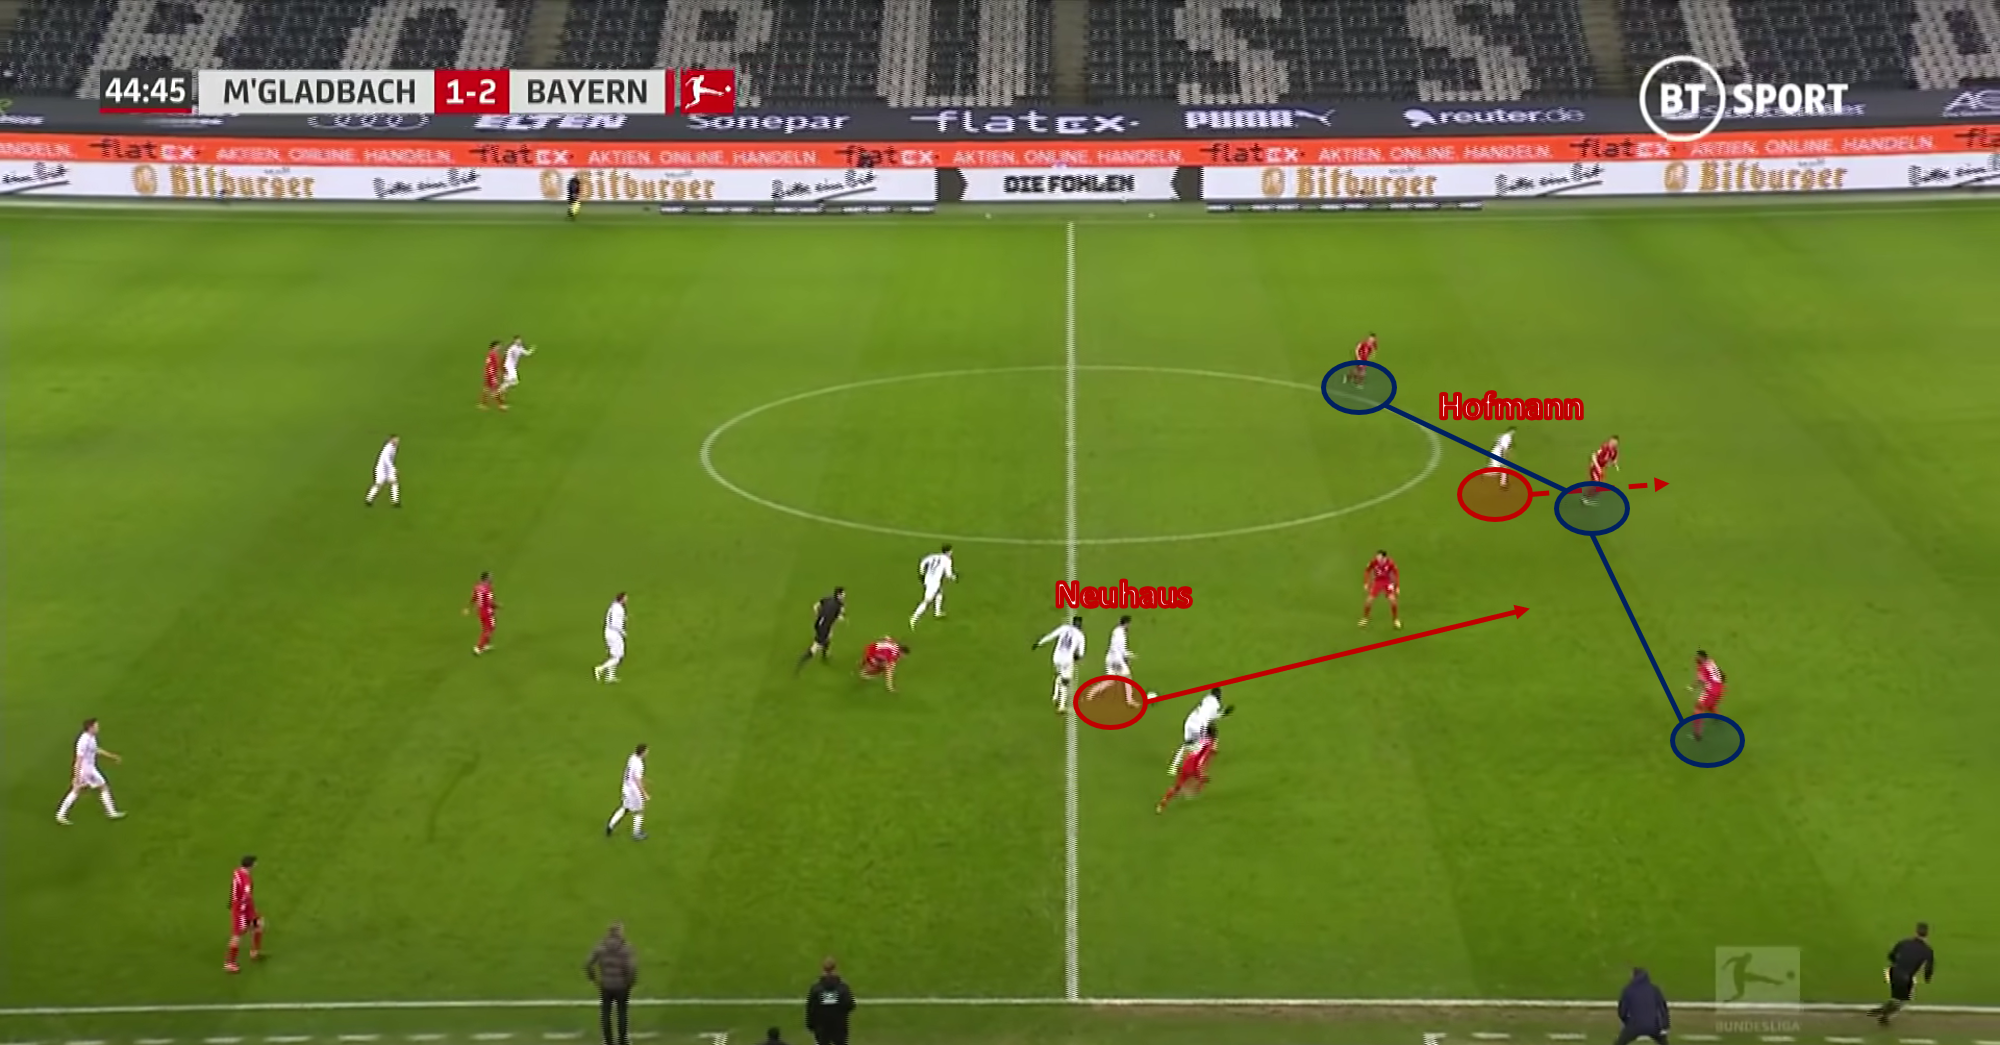 Jonas Hofmann: Glabach's ultimate utility man - scout report - tactical analysis tactics